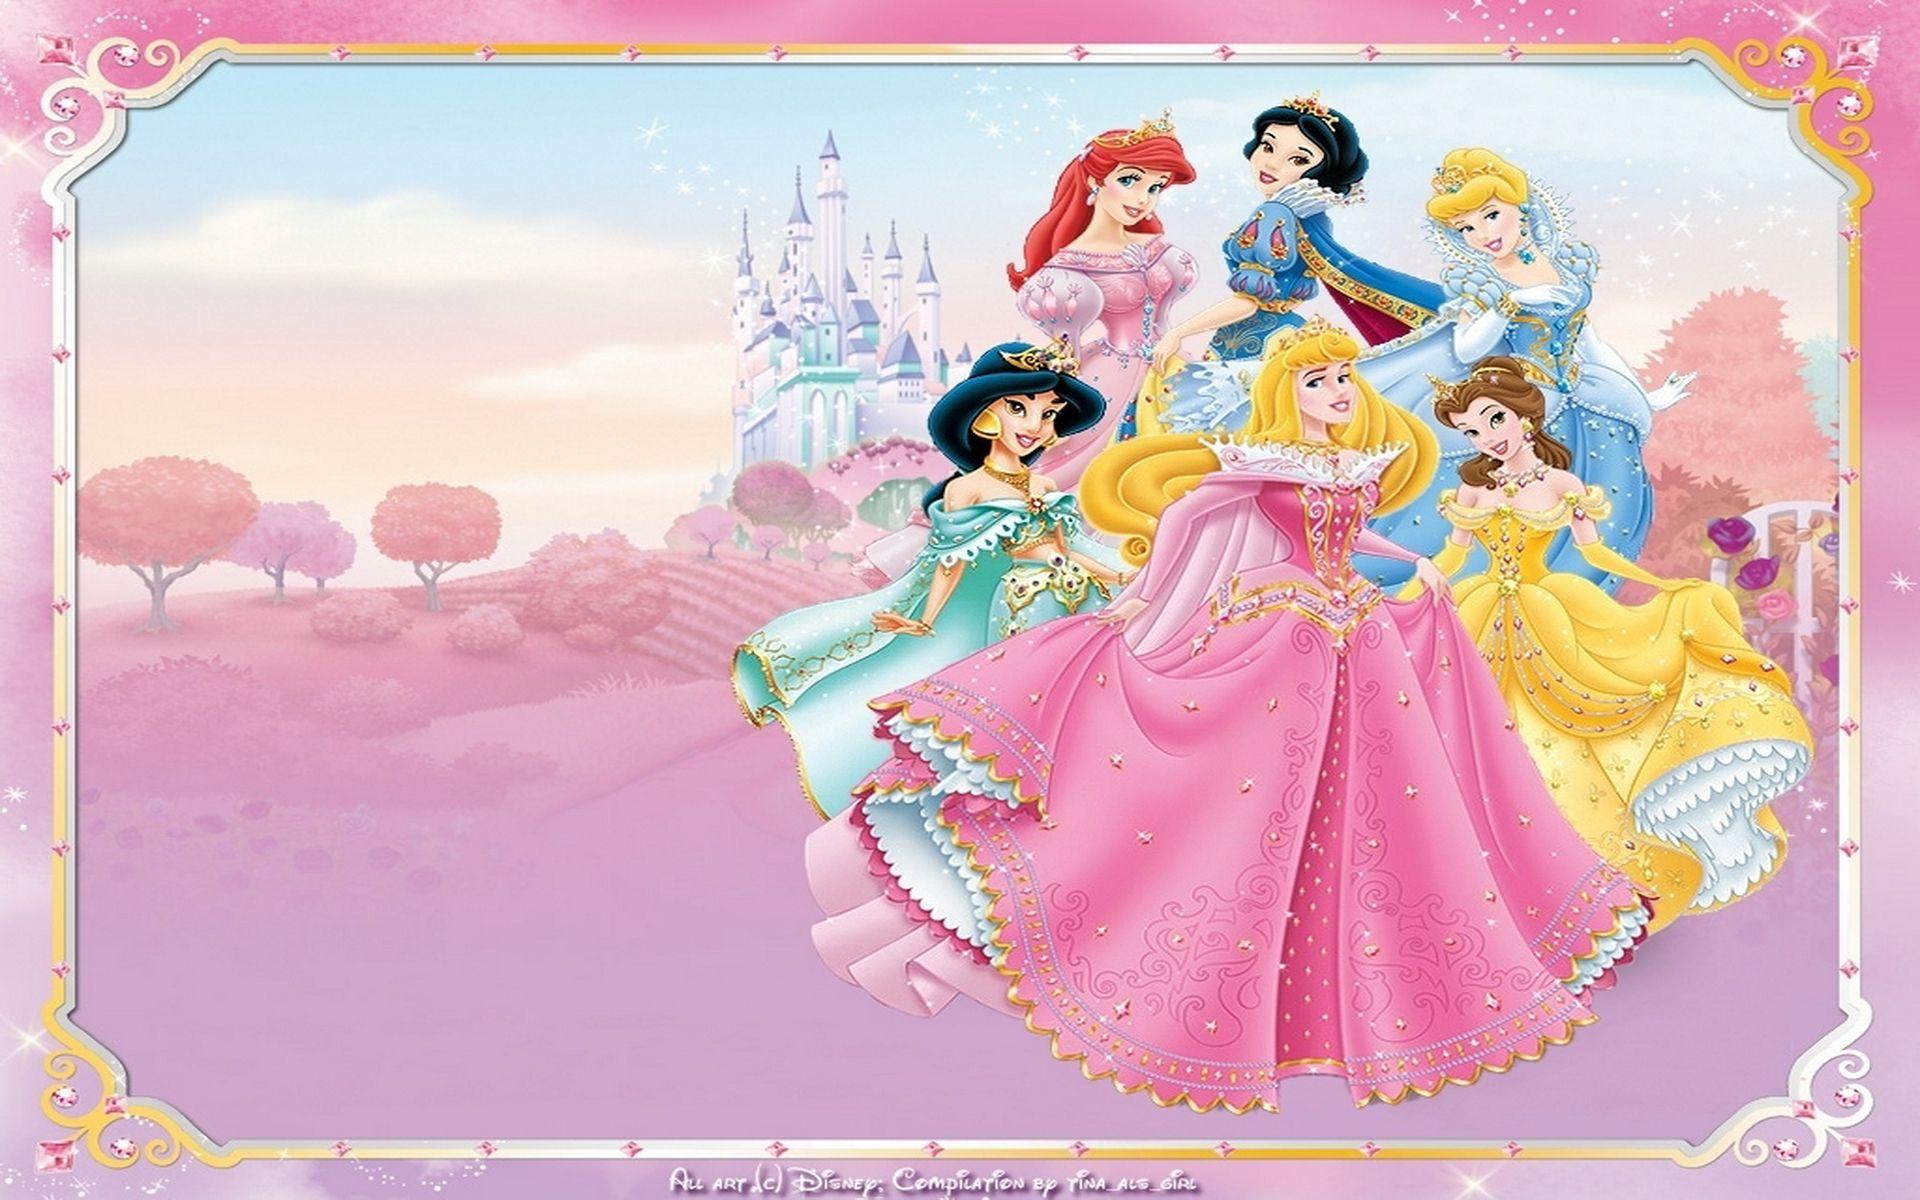 Pin By Emi Kat On Disney Birthday Princess Birthday Invitations Princess Invitations Disney Princess Birthday